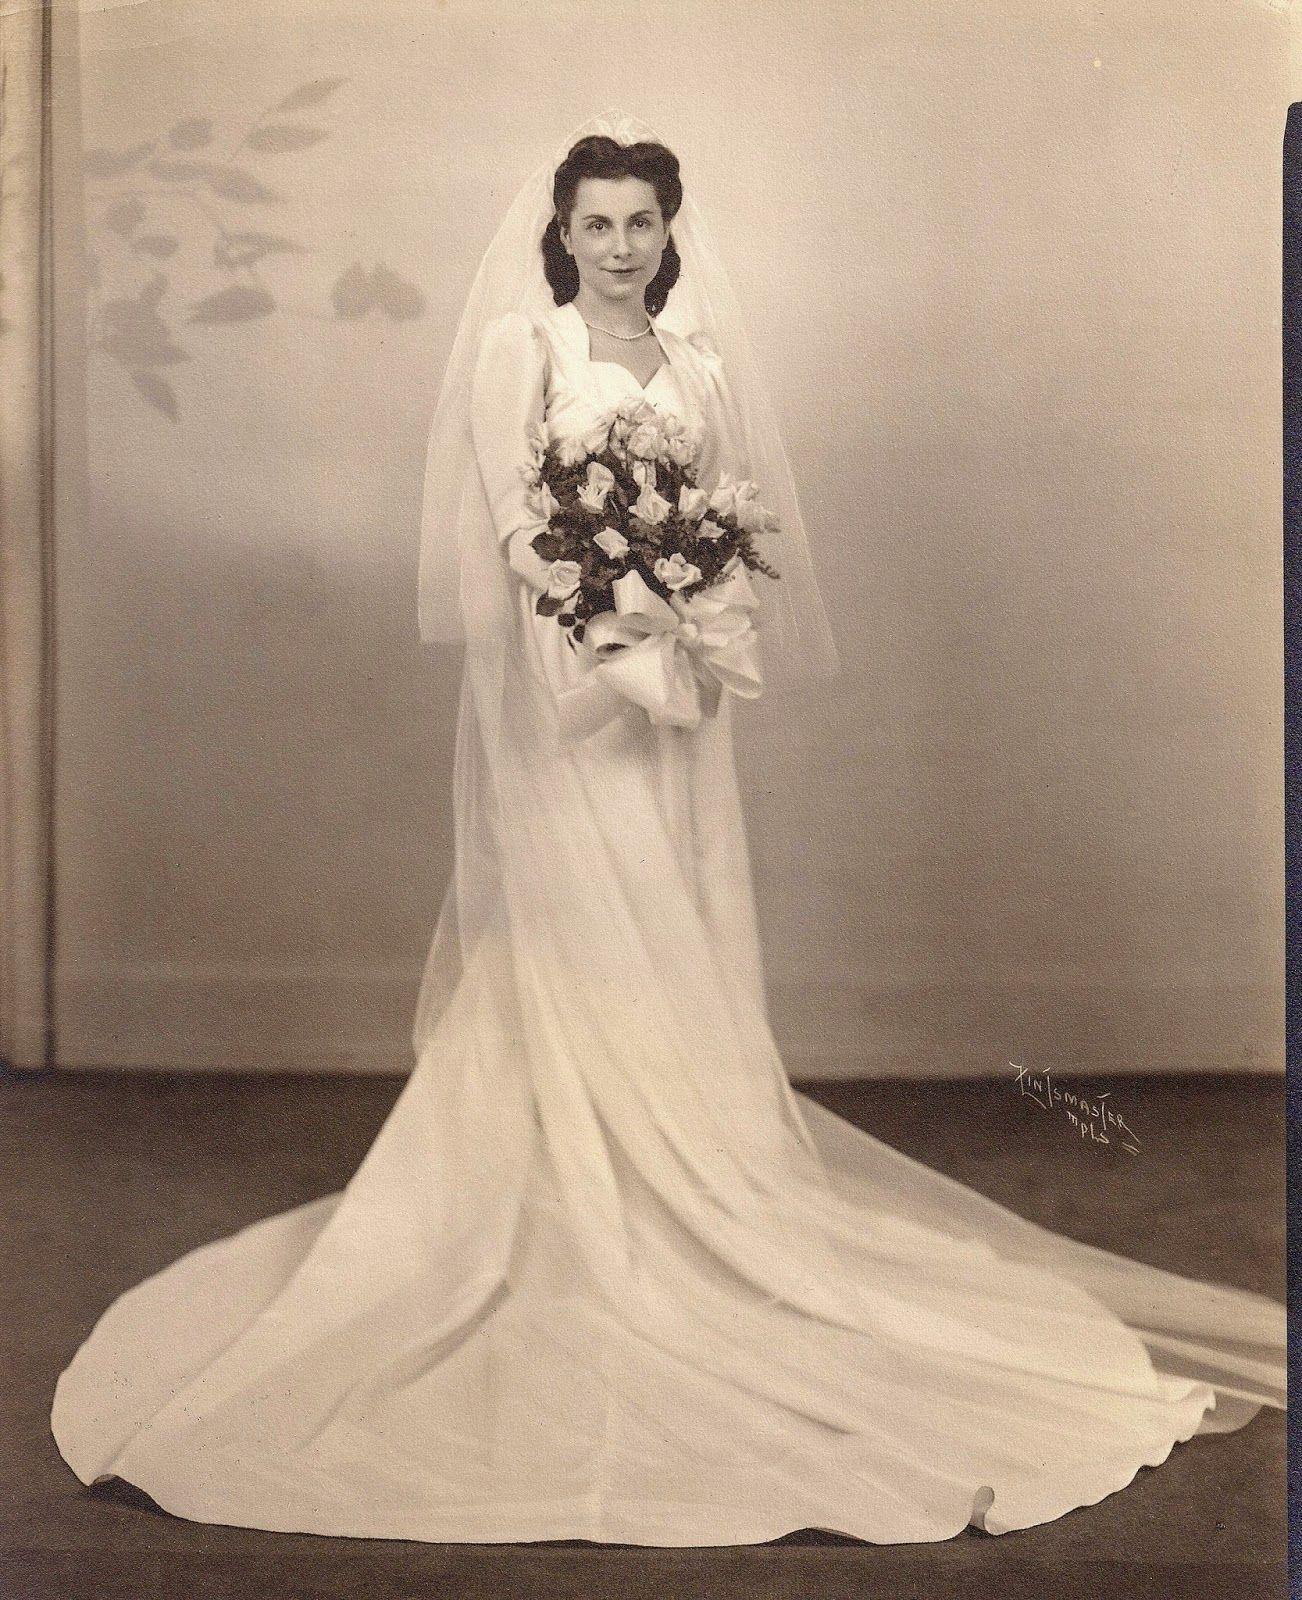 Julia Koshuba Noznick, Minneapolis MN, 1944